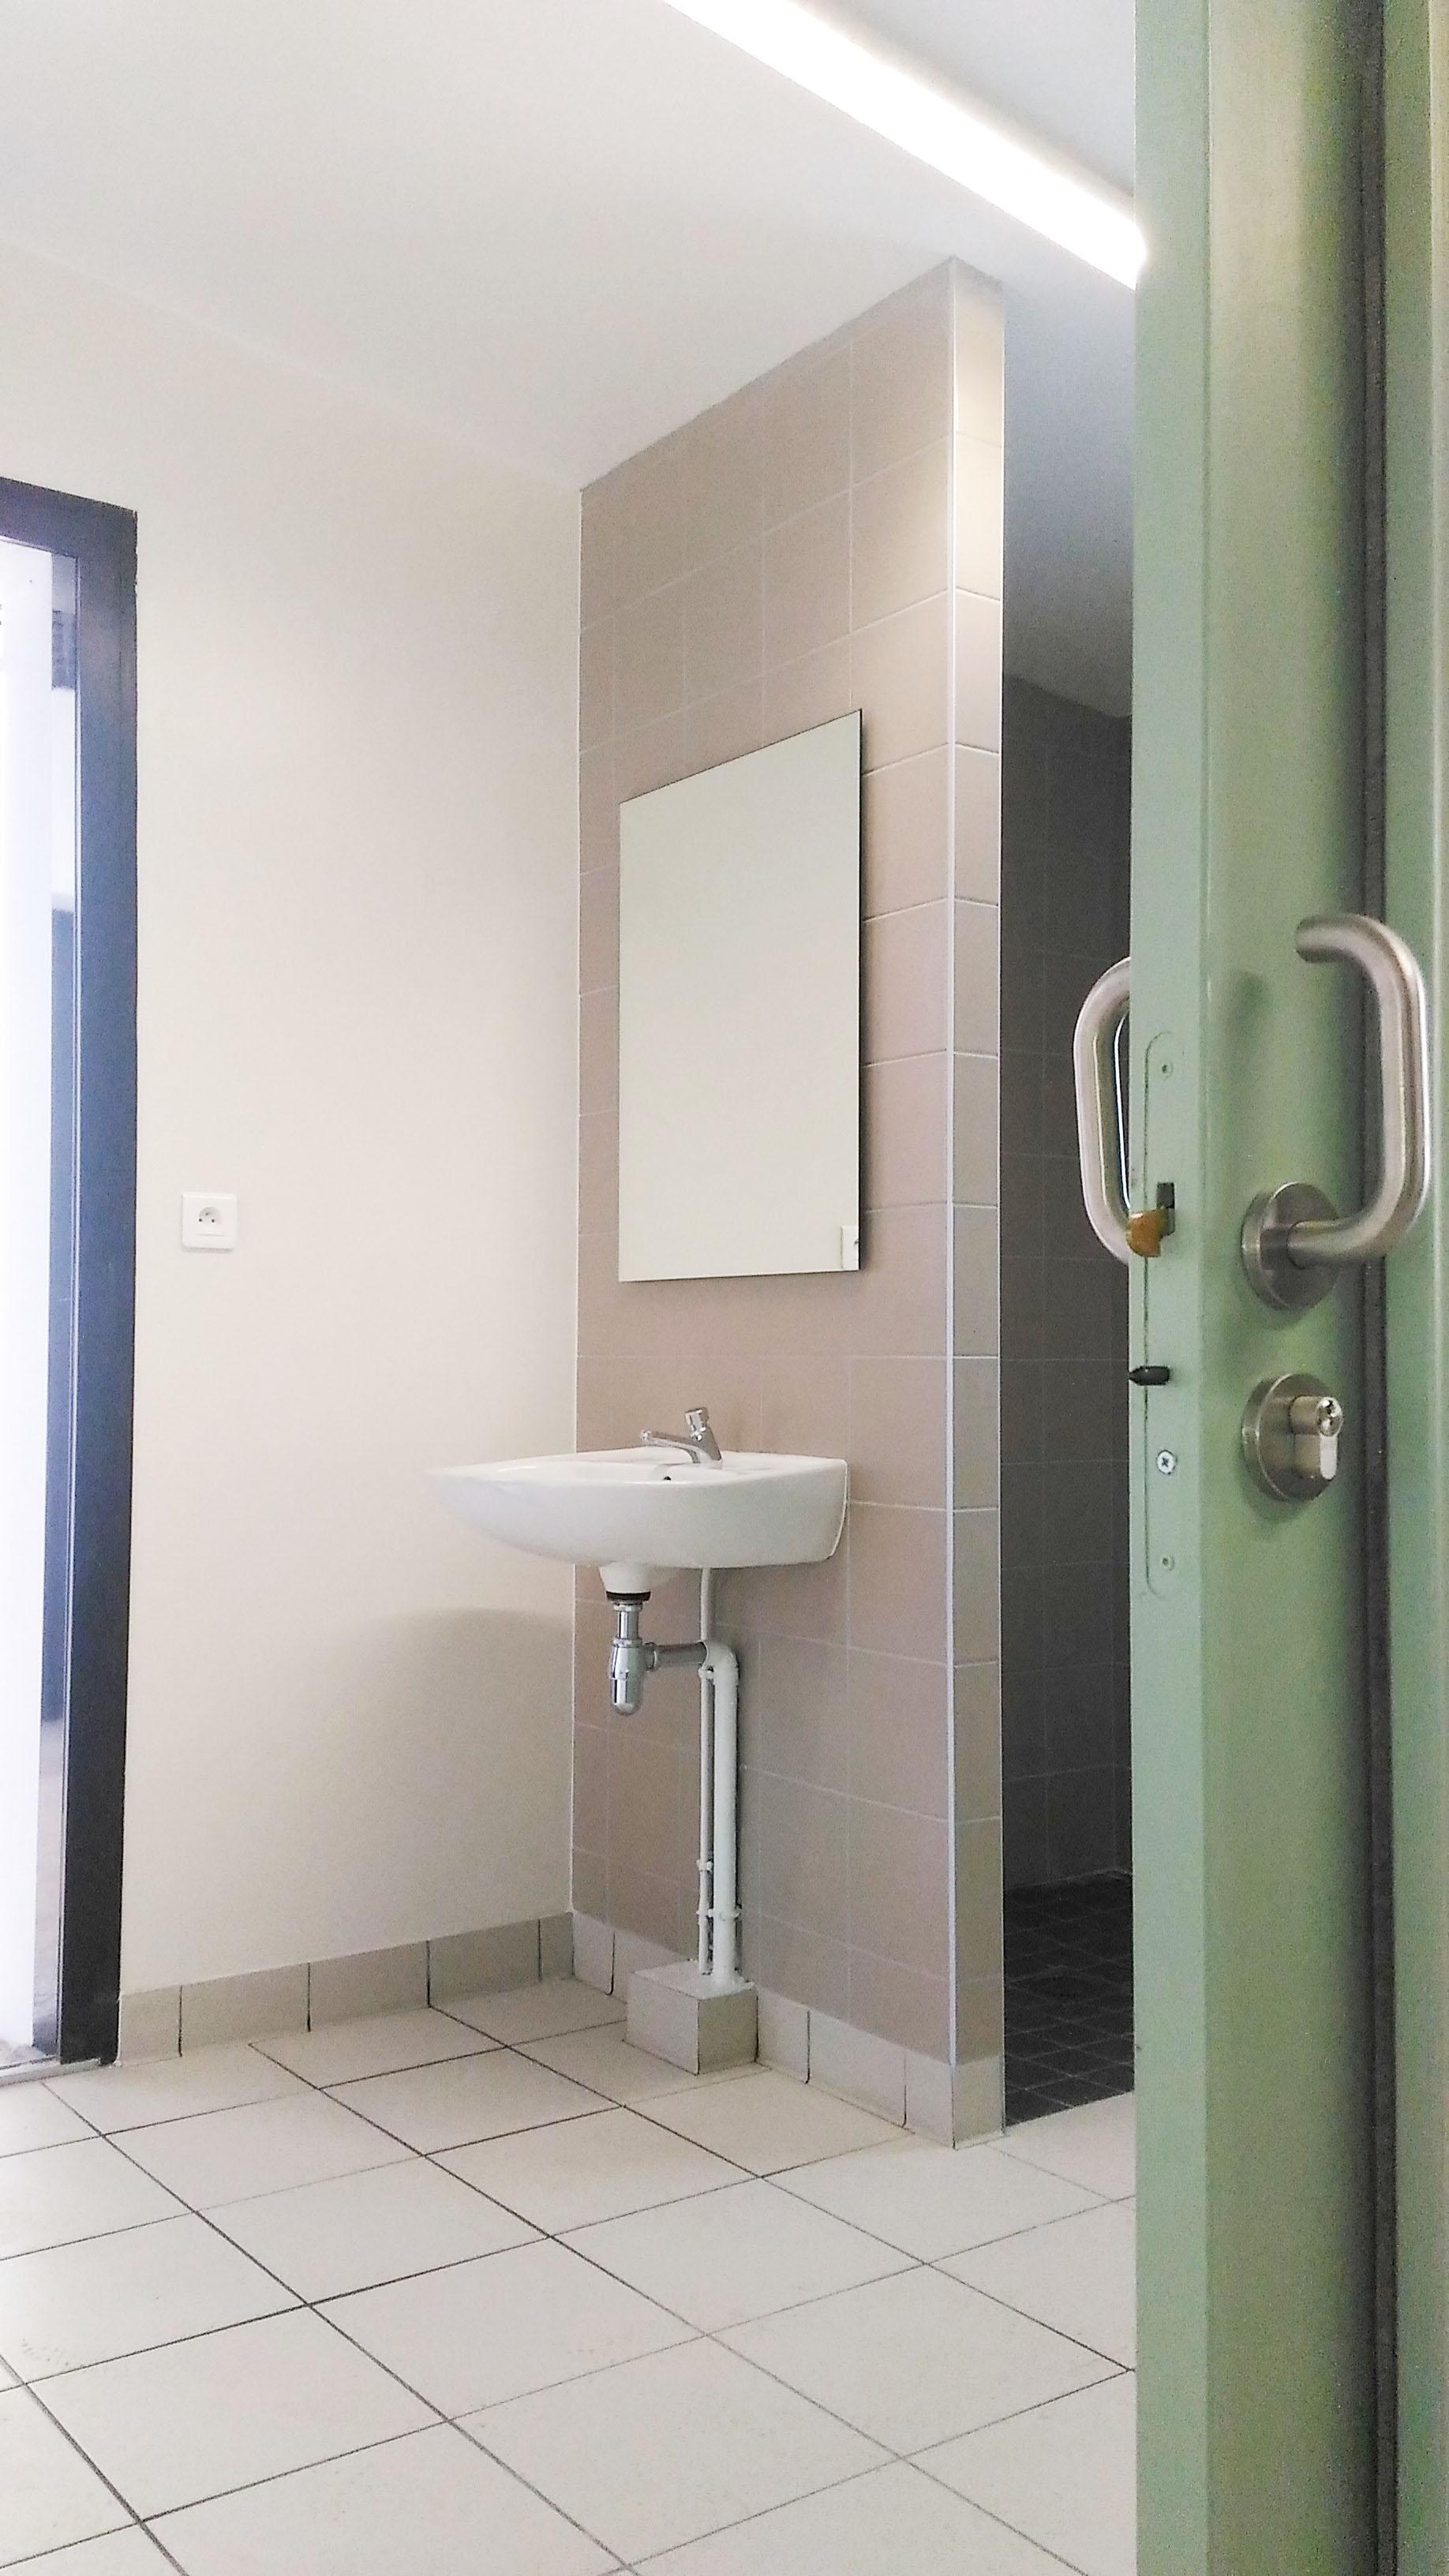 sanitaire arbitres